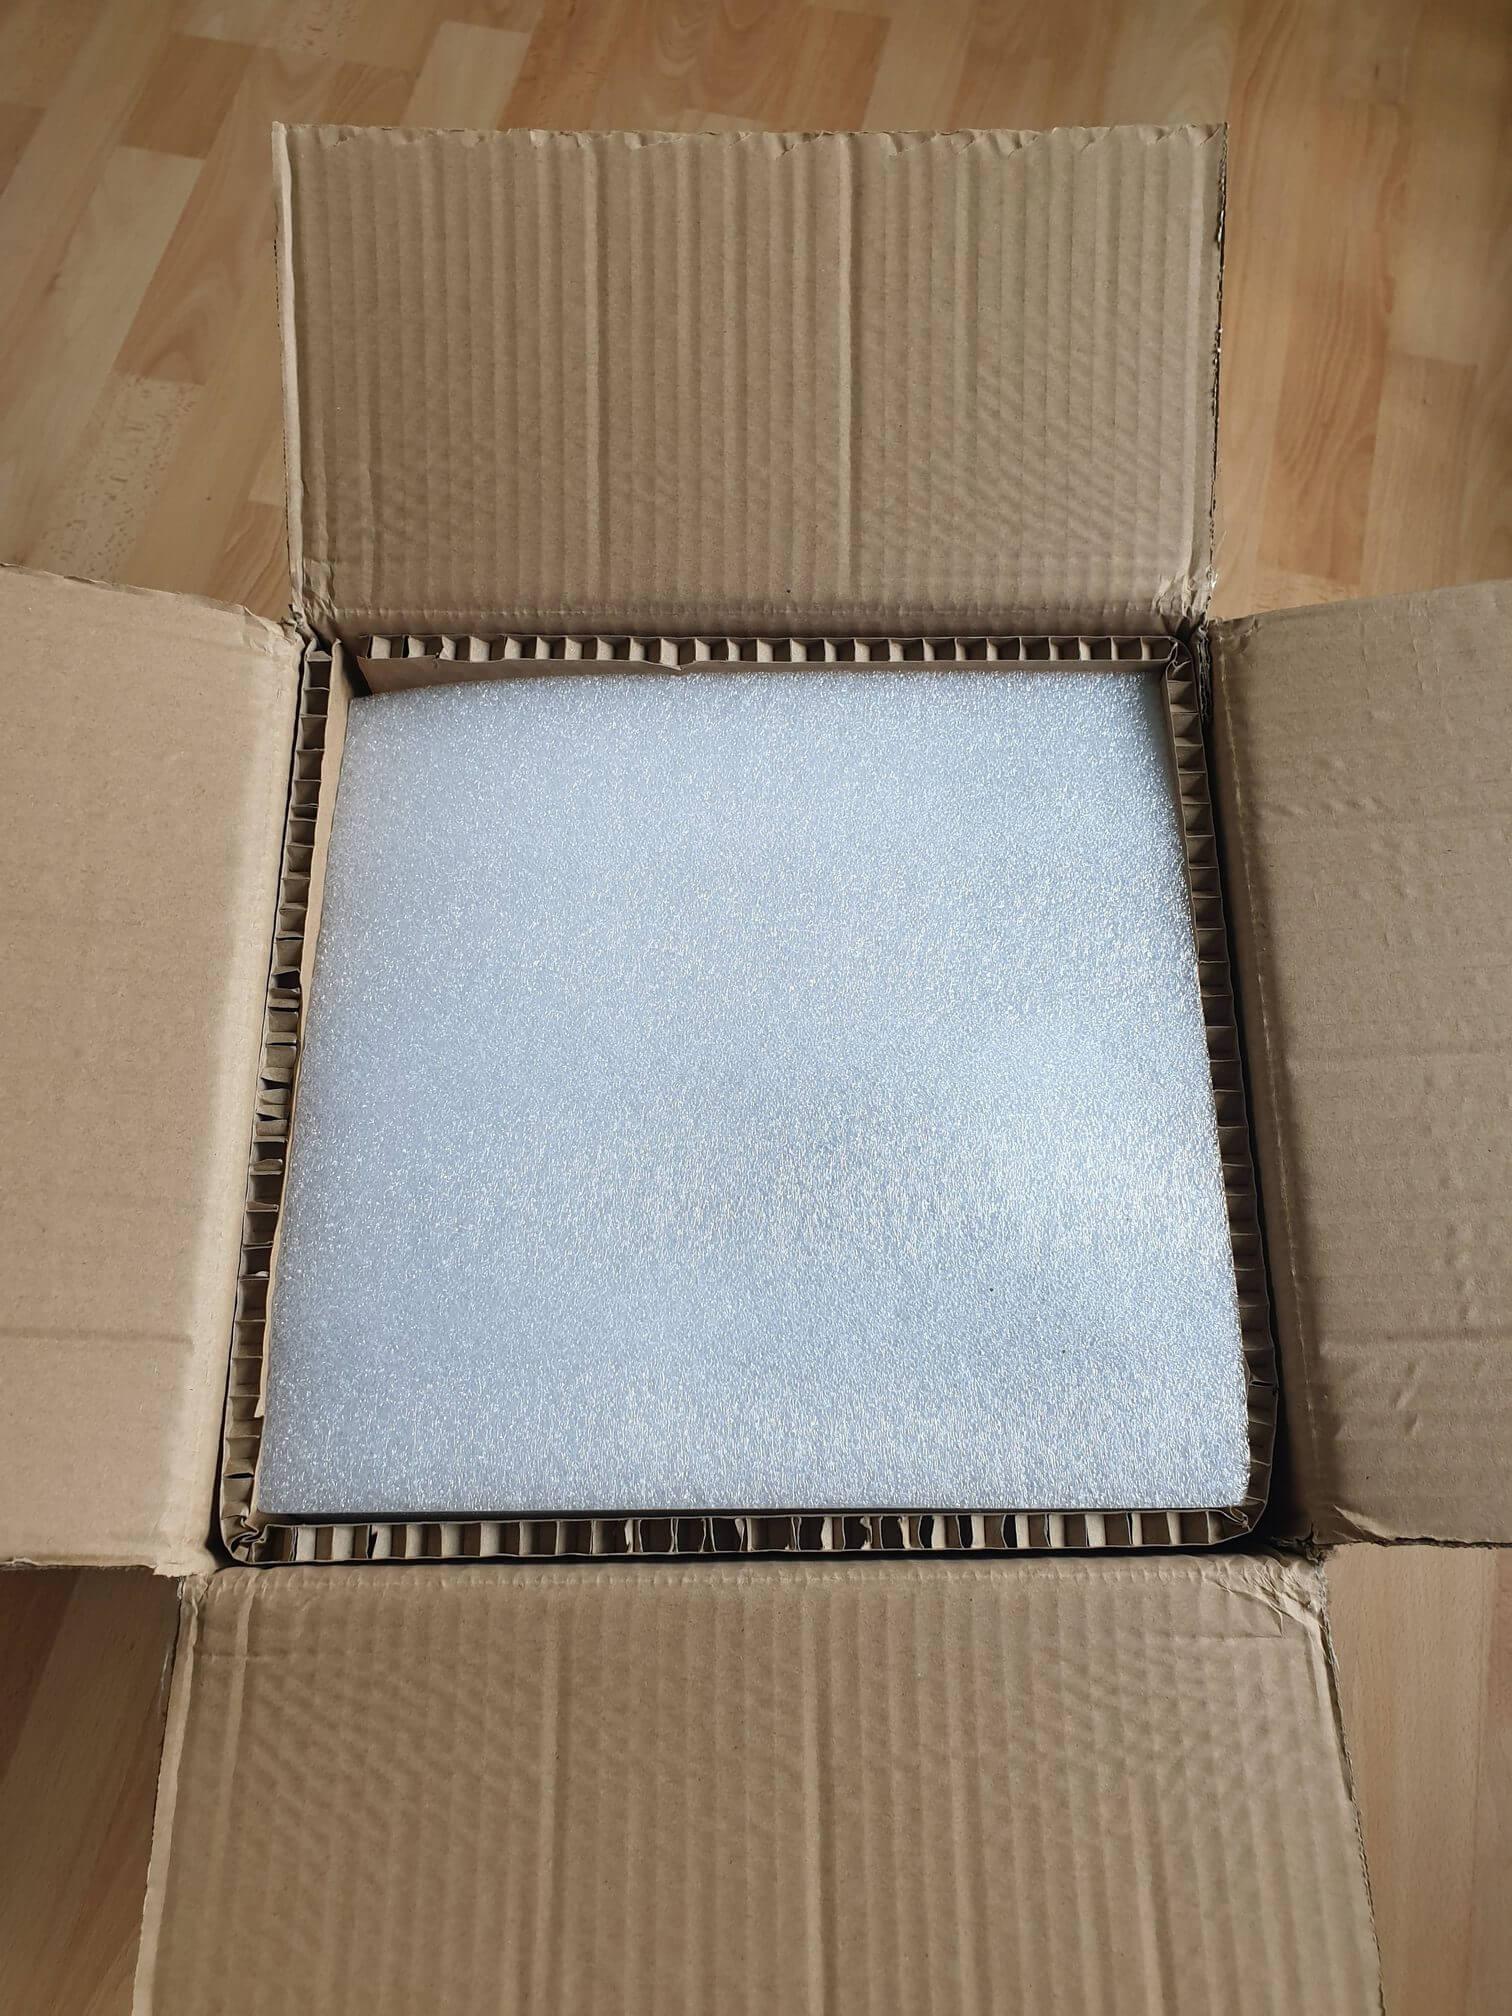 Longer Cube2 Mini Packaging 3 | Cube2 Mini Review - 3D Printer for Kids